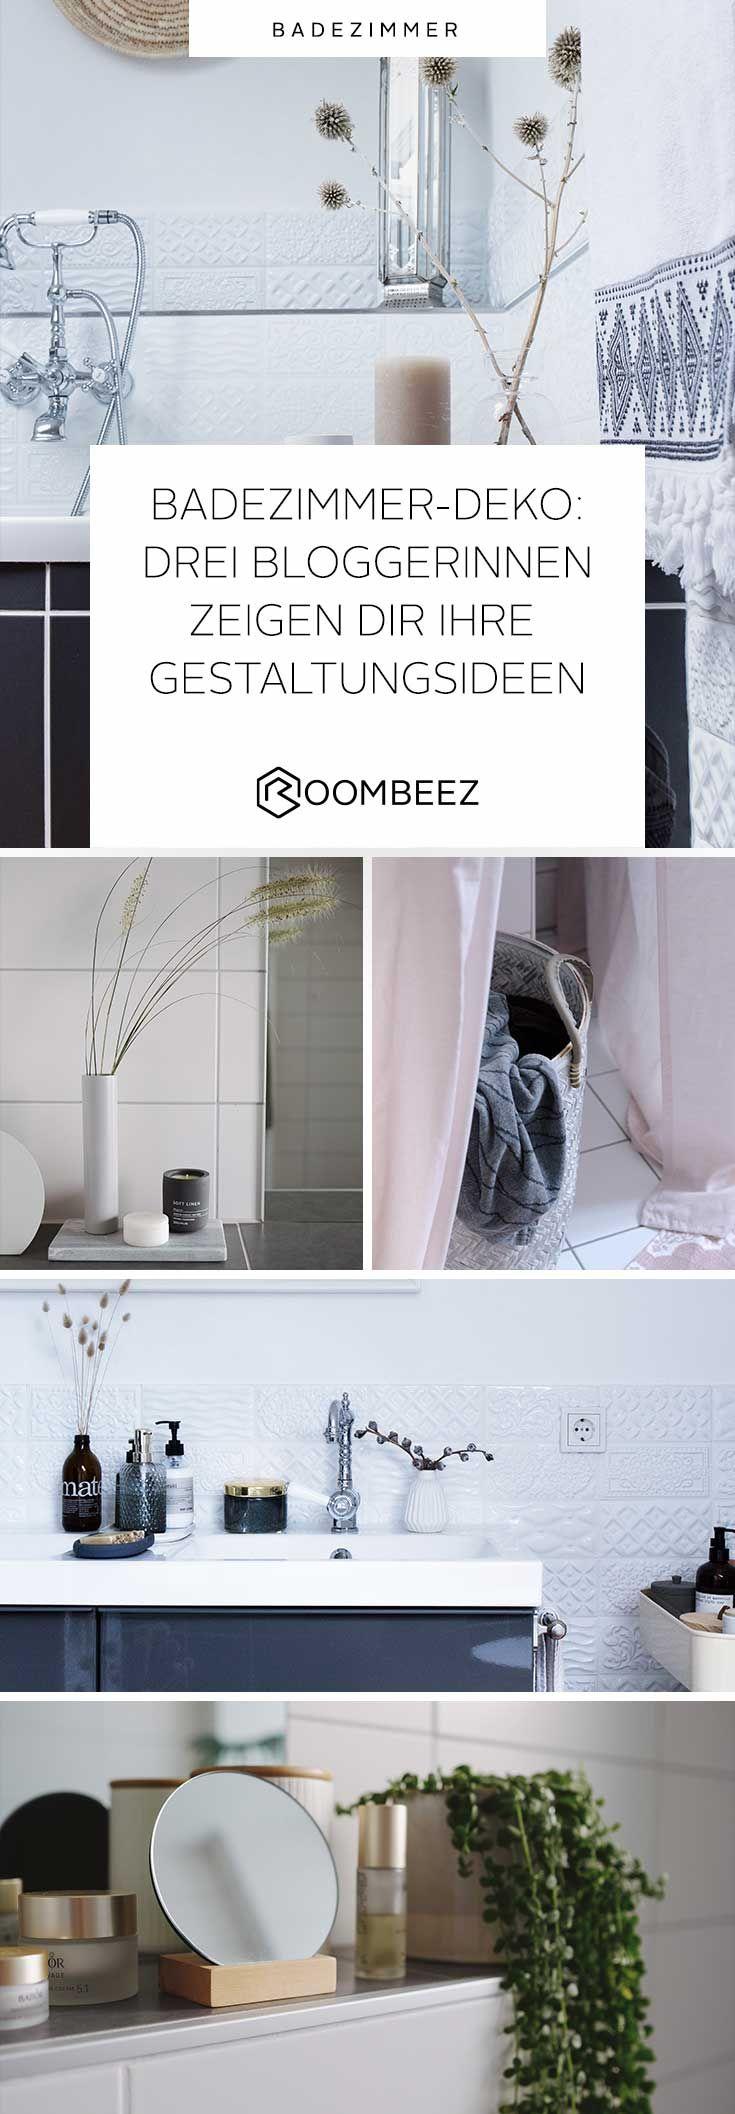 Badezimmer Deko Schone Ideen Fur Dein Bad Badezimmer Badezimmer Deko Und Badezimmer Ablage